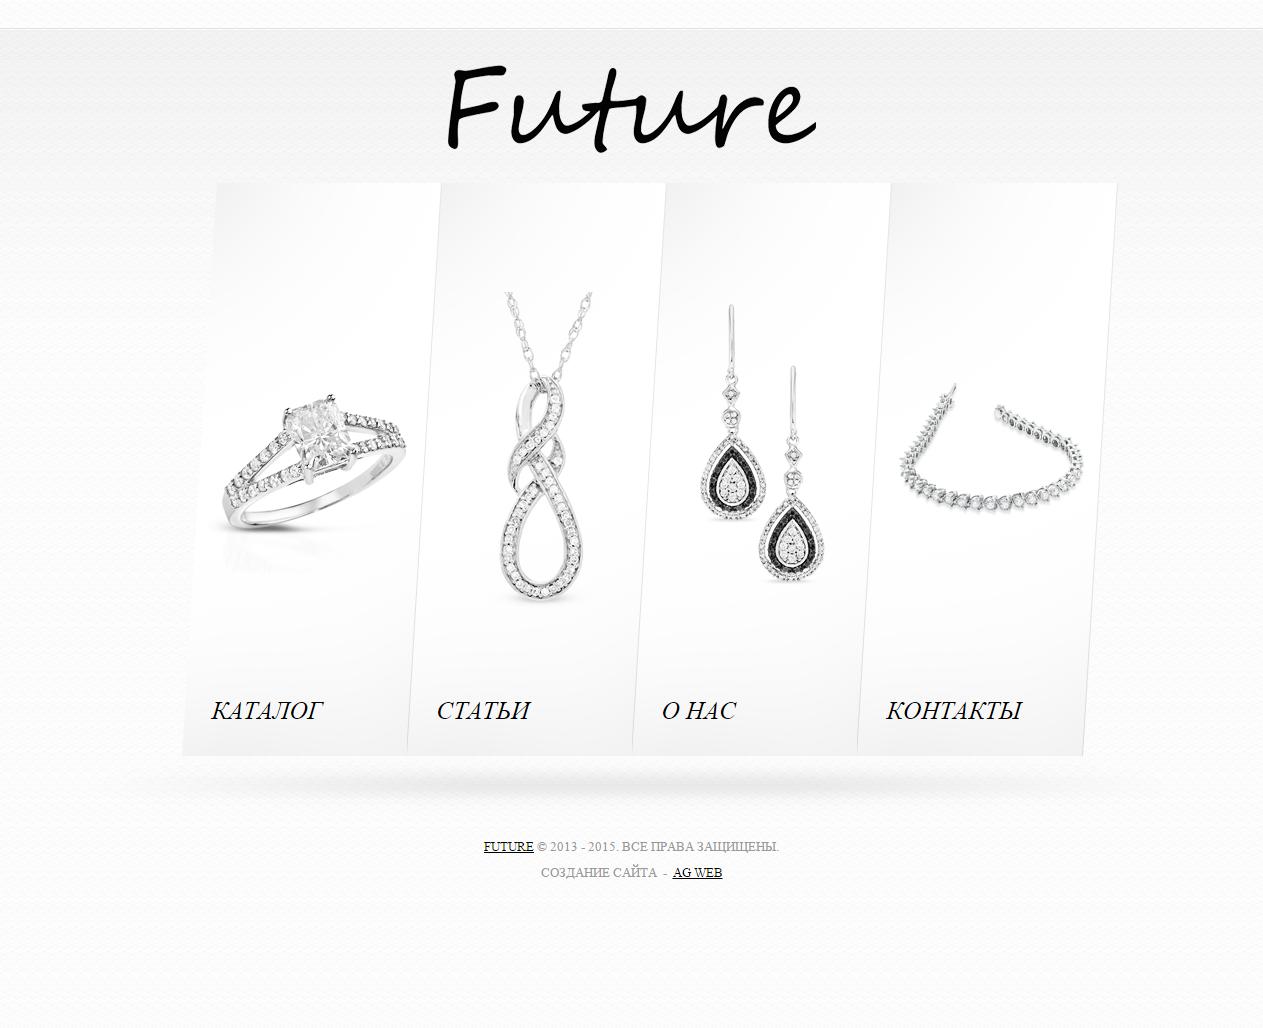 Интернет магазин http://futurex.com.ua/